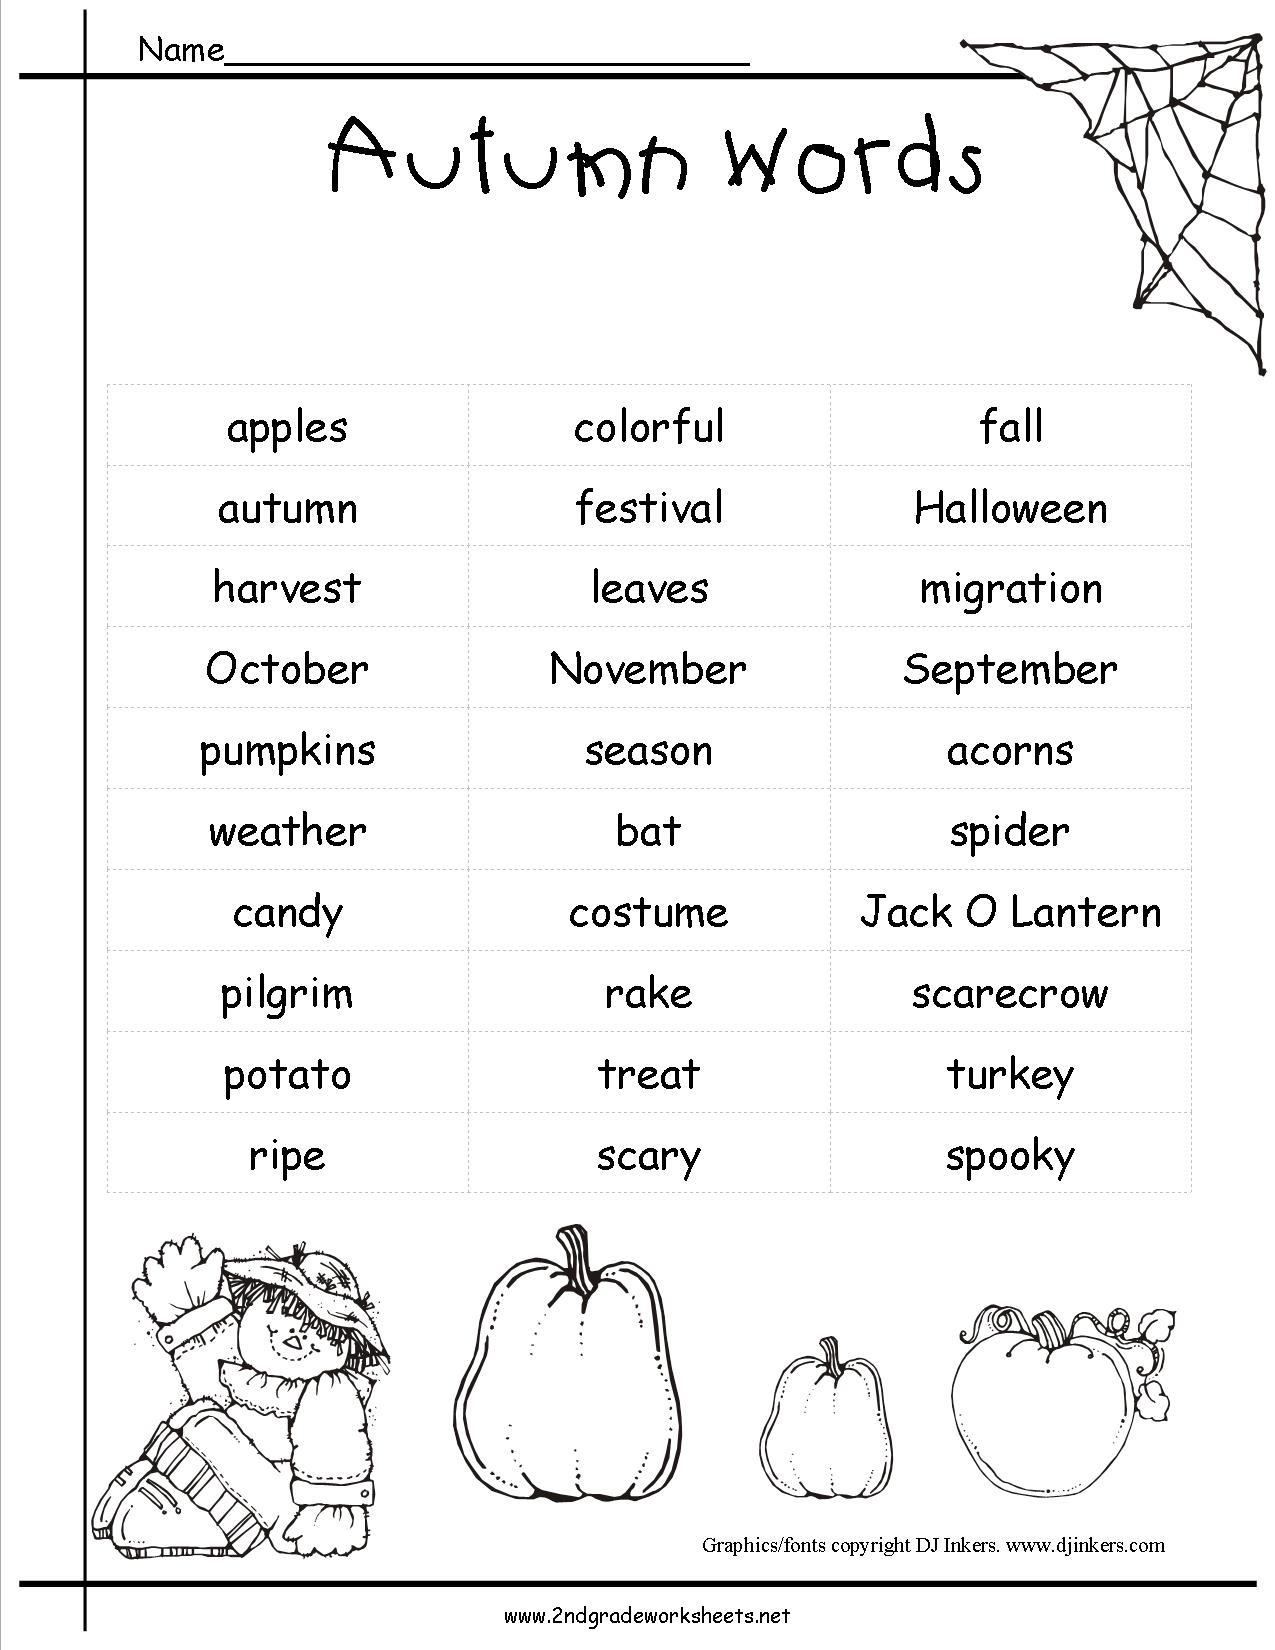 Autumn Theme Worksheets And Printouts. - Free Printable Autumn Worksheets